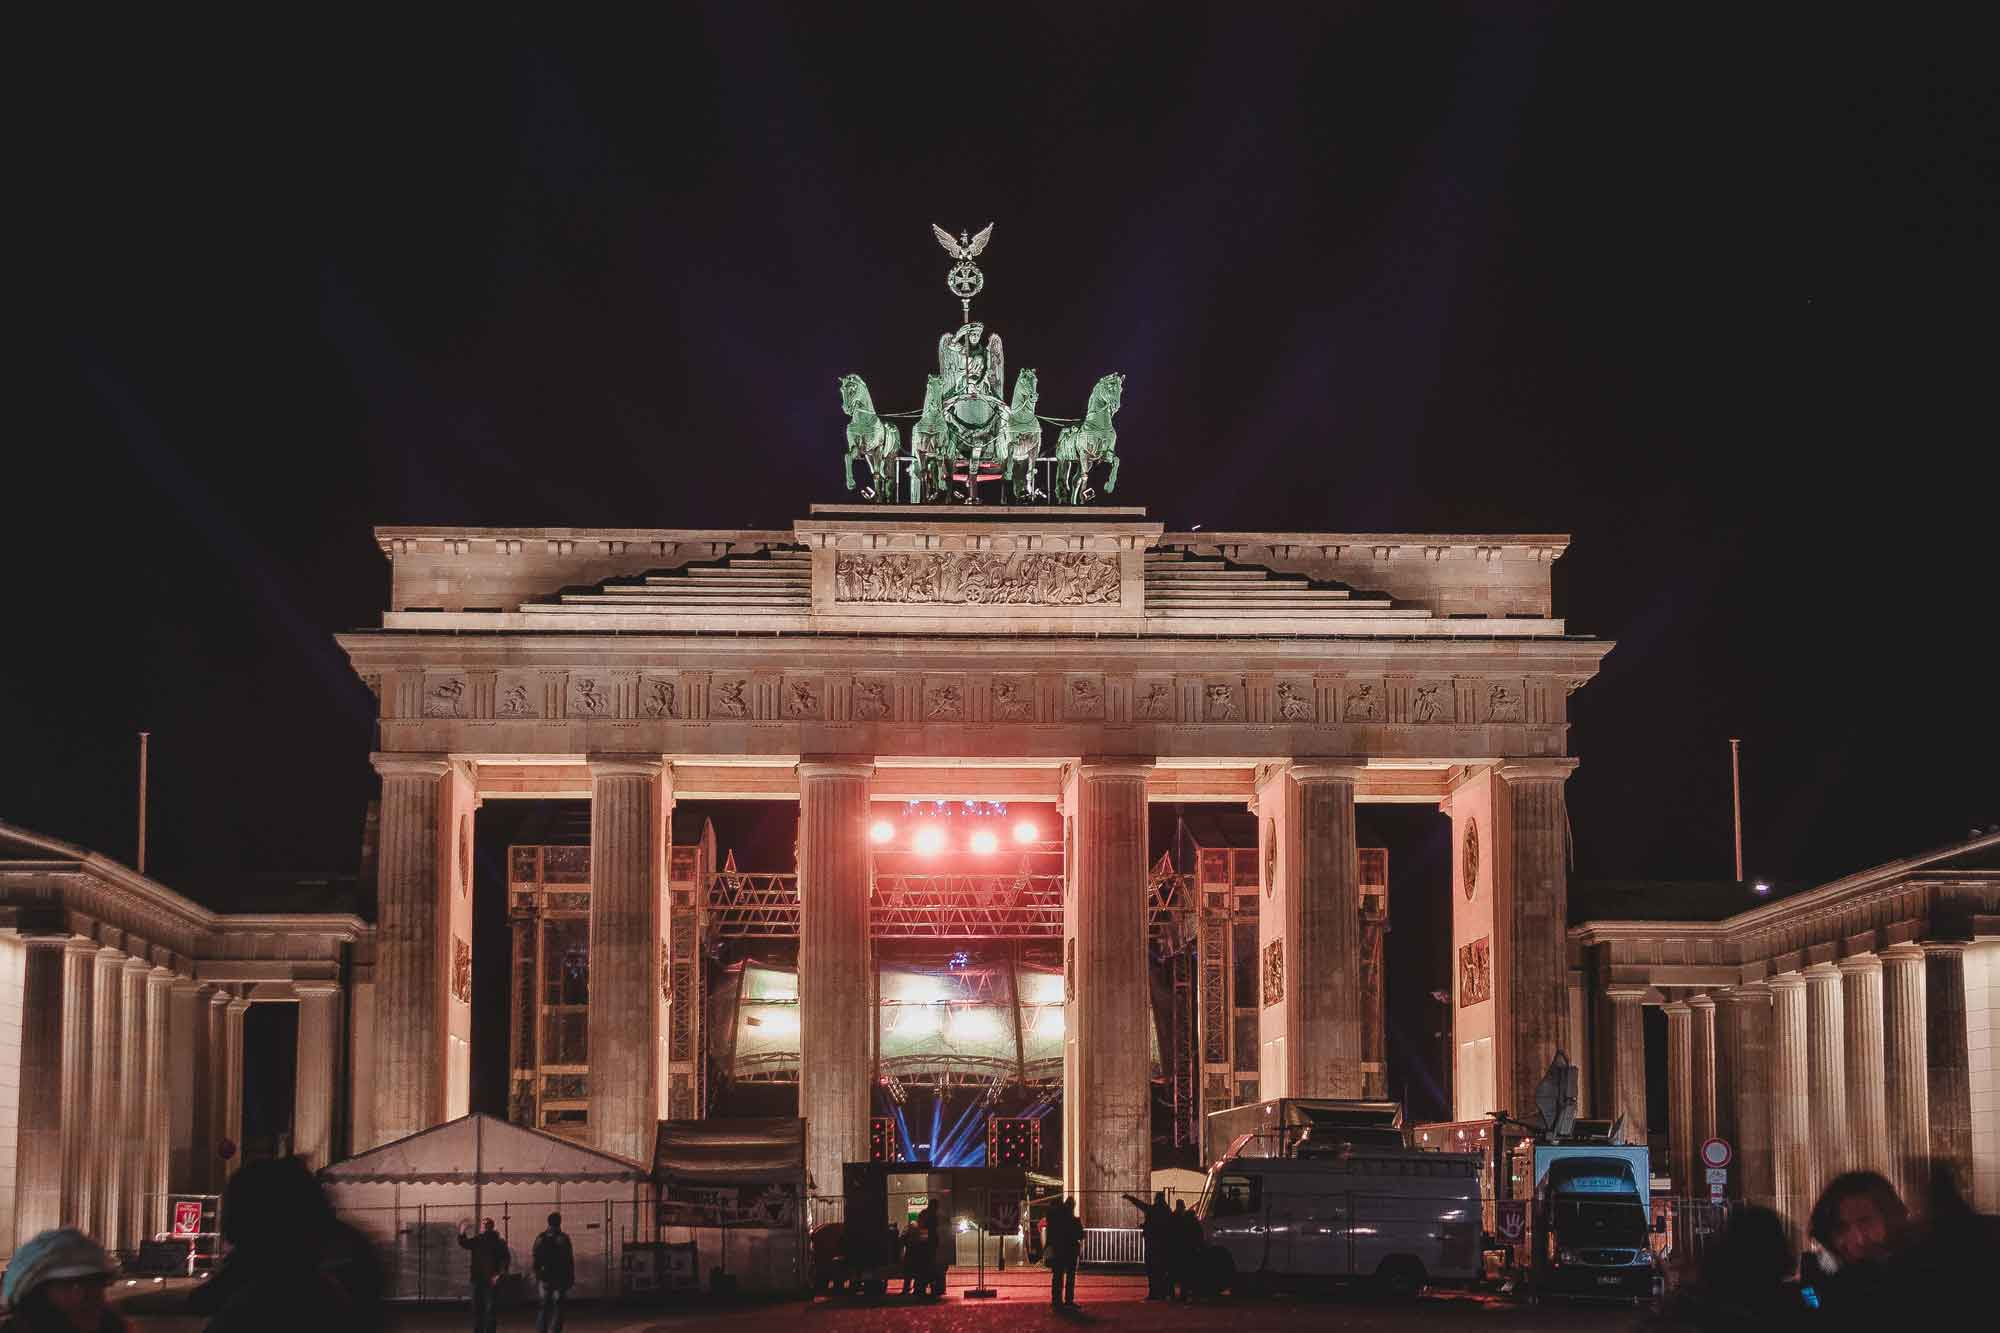 viaggio-a-berlino-porta-brandeburgo